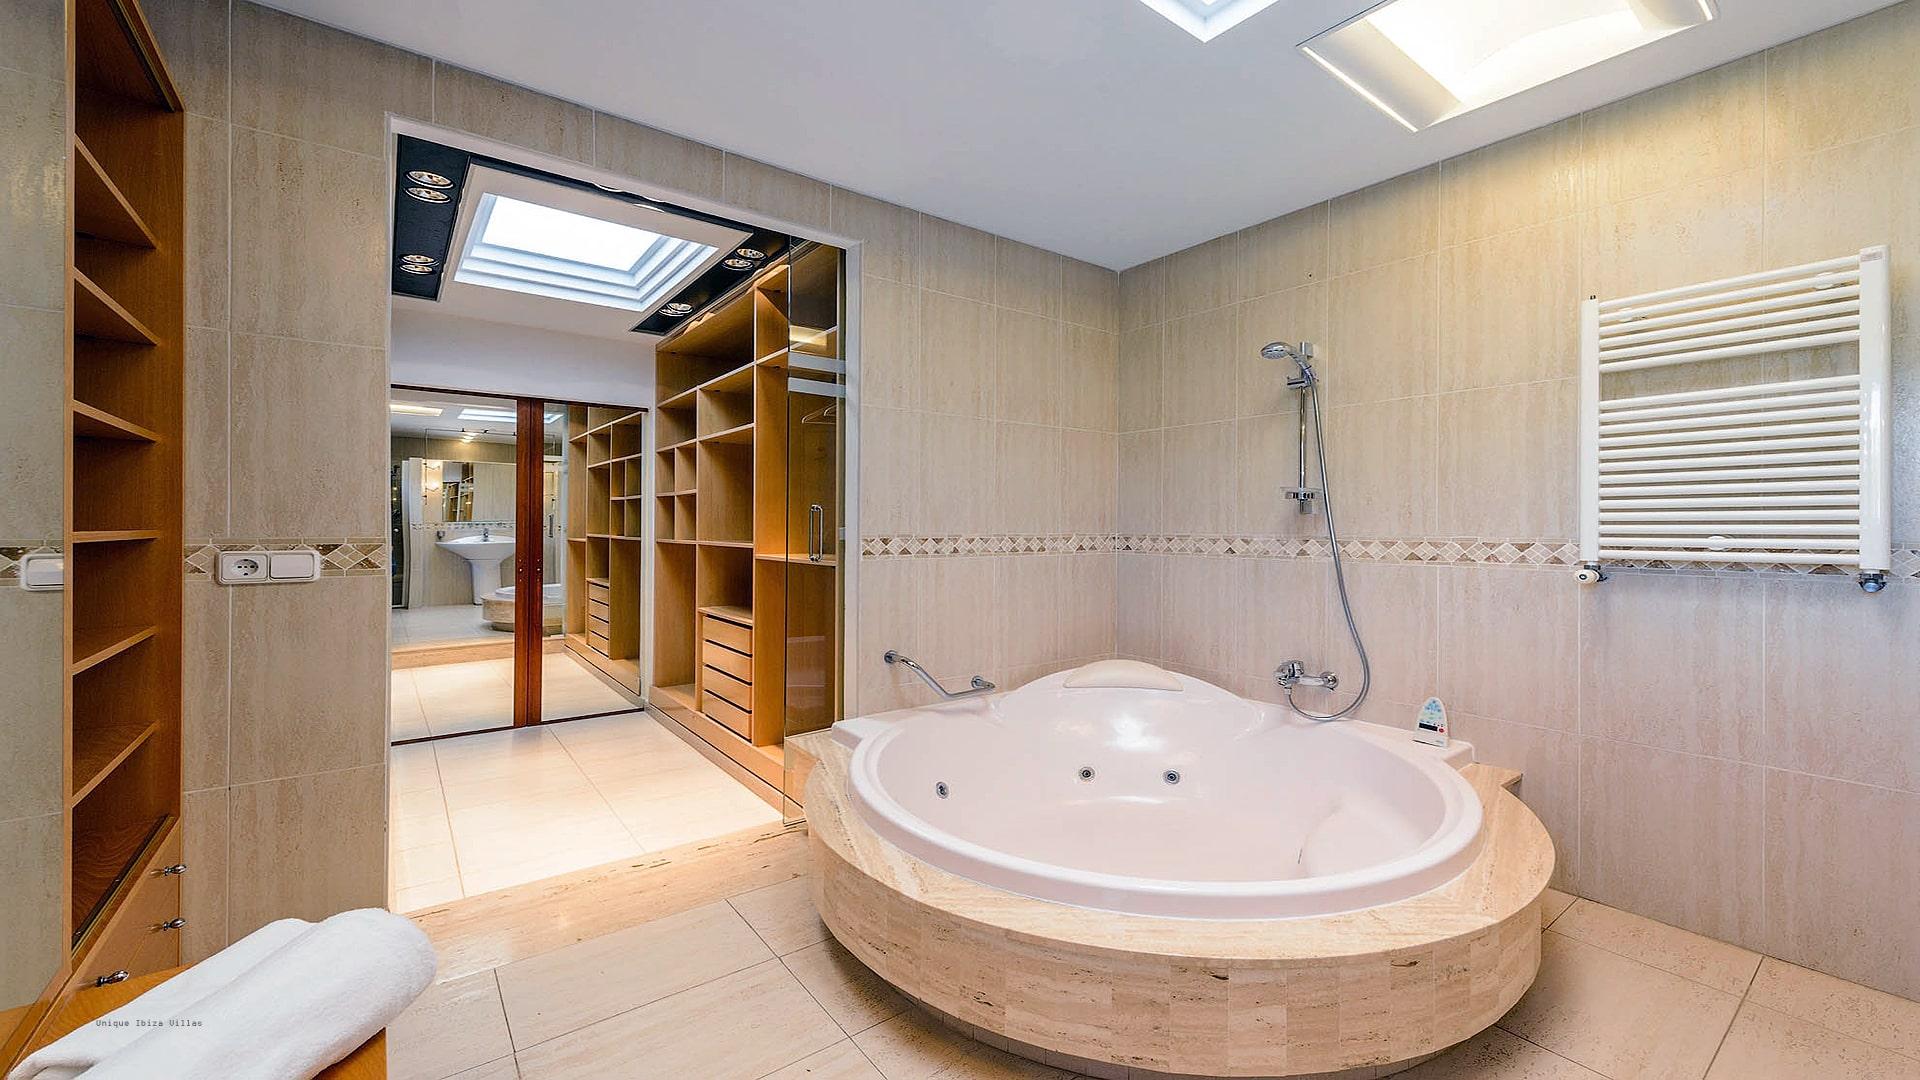 Villa Can Fluxa Ibiza 36 Bedroom 1